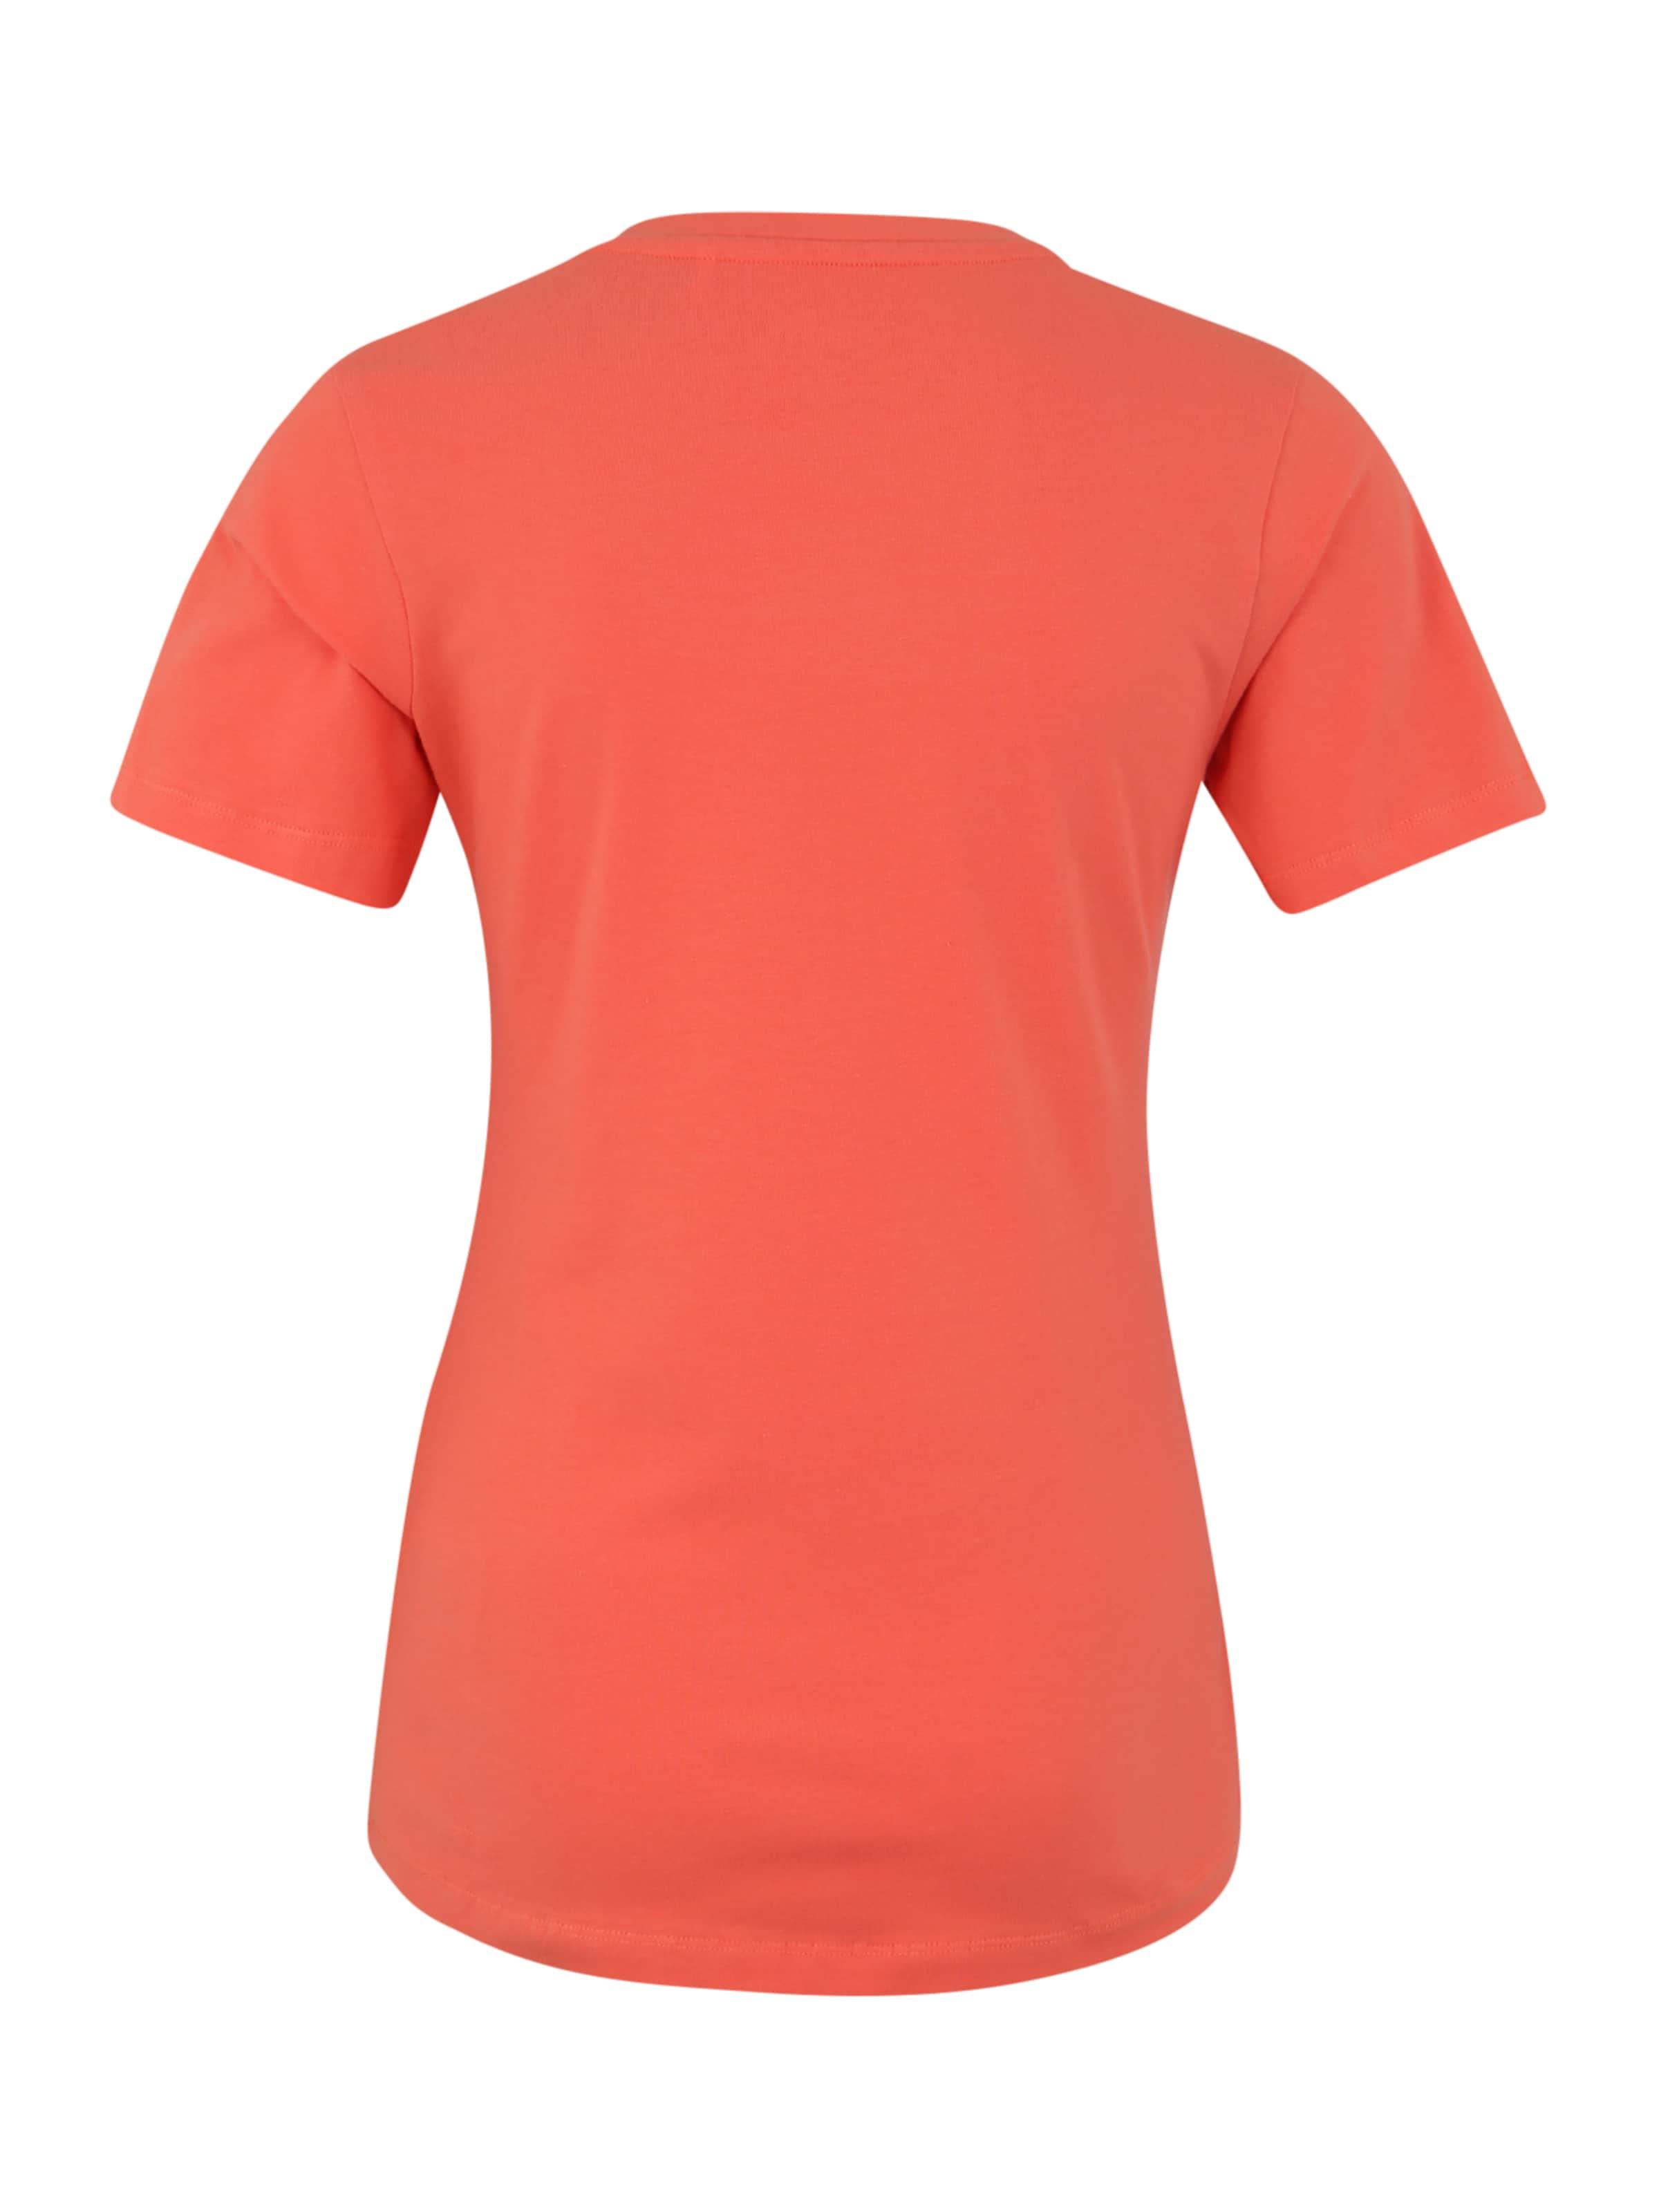 Ellesse Orange In 'barletta' Ellesse Shirt DH9W2YbeEI